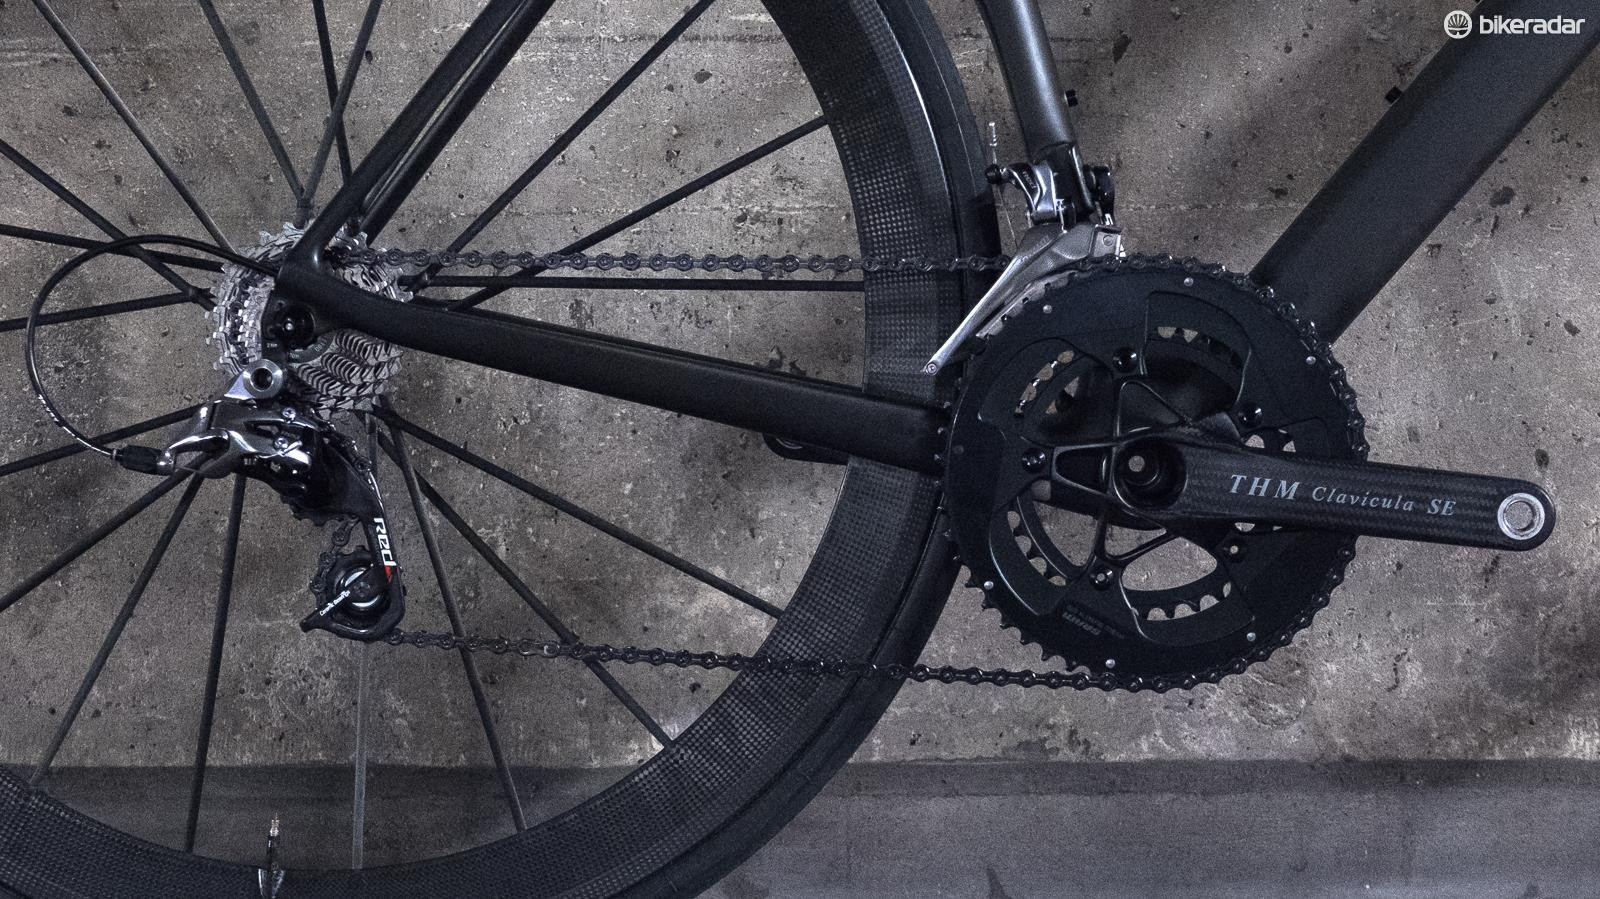 91f2c06a77a Canyon Ultimate CF Evo 10.0 SL review - BikeRadar